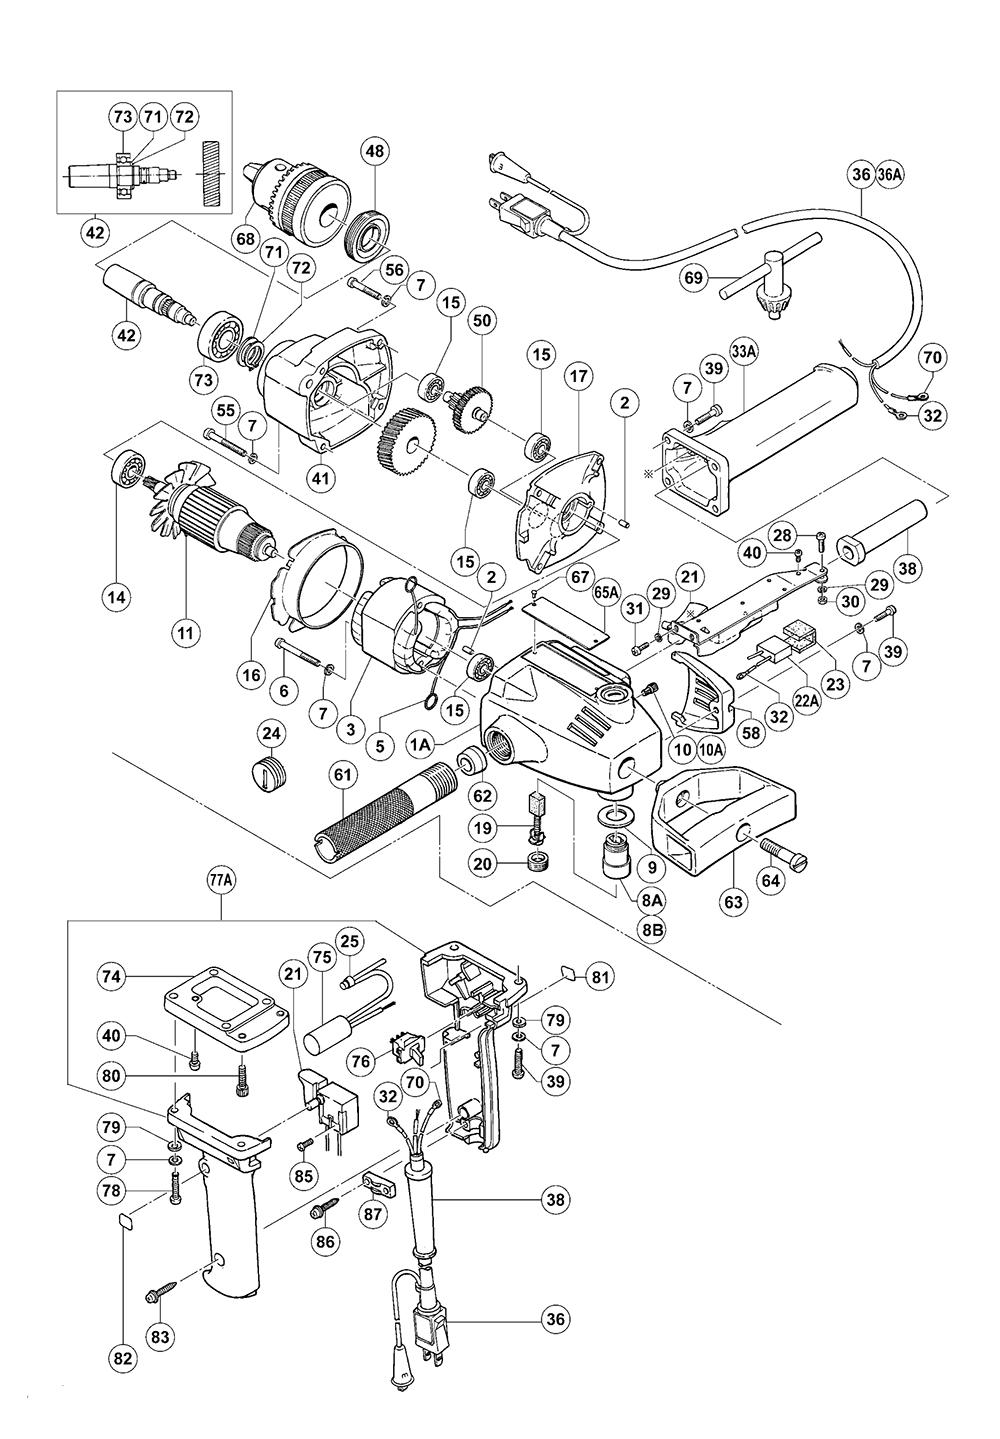 Hitachi BU-PN3 Parts List | Hitachi BU-PN3 Repair Parts